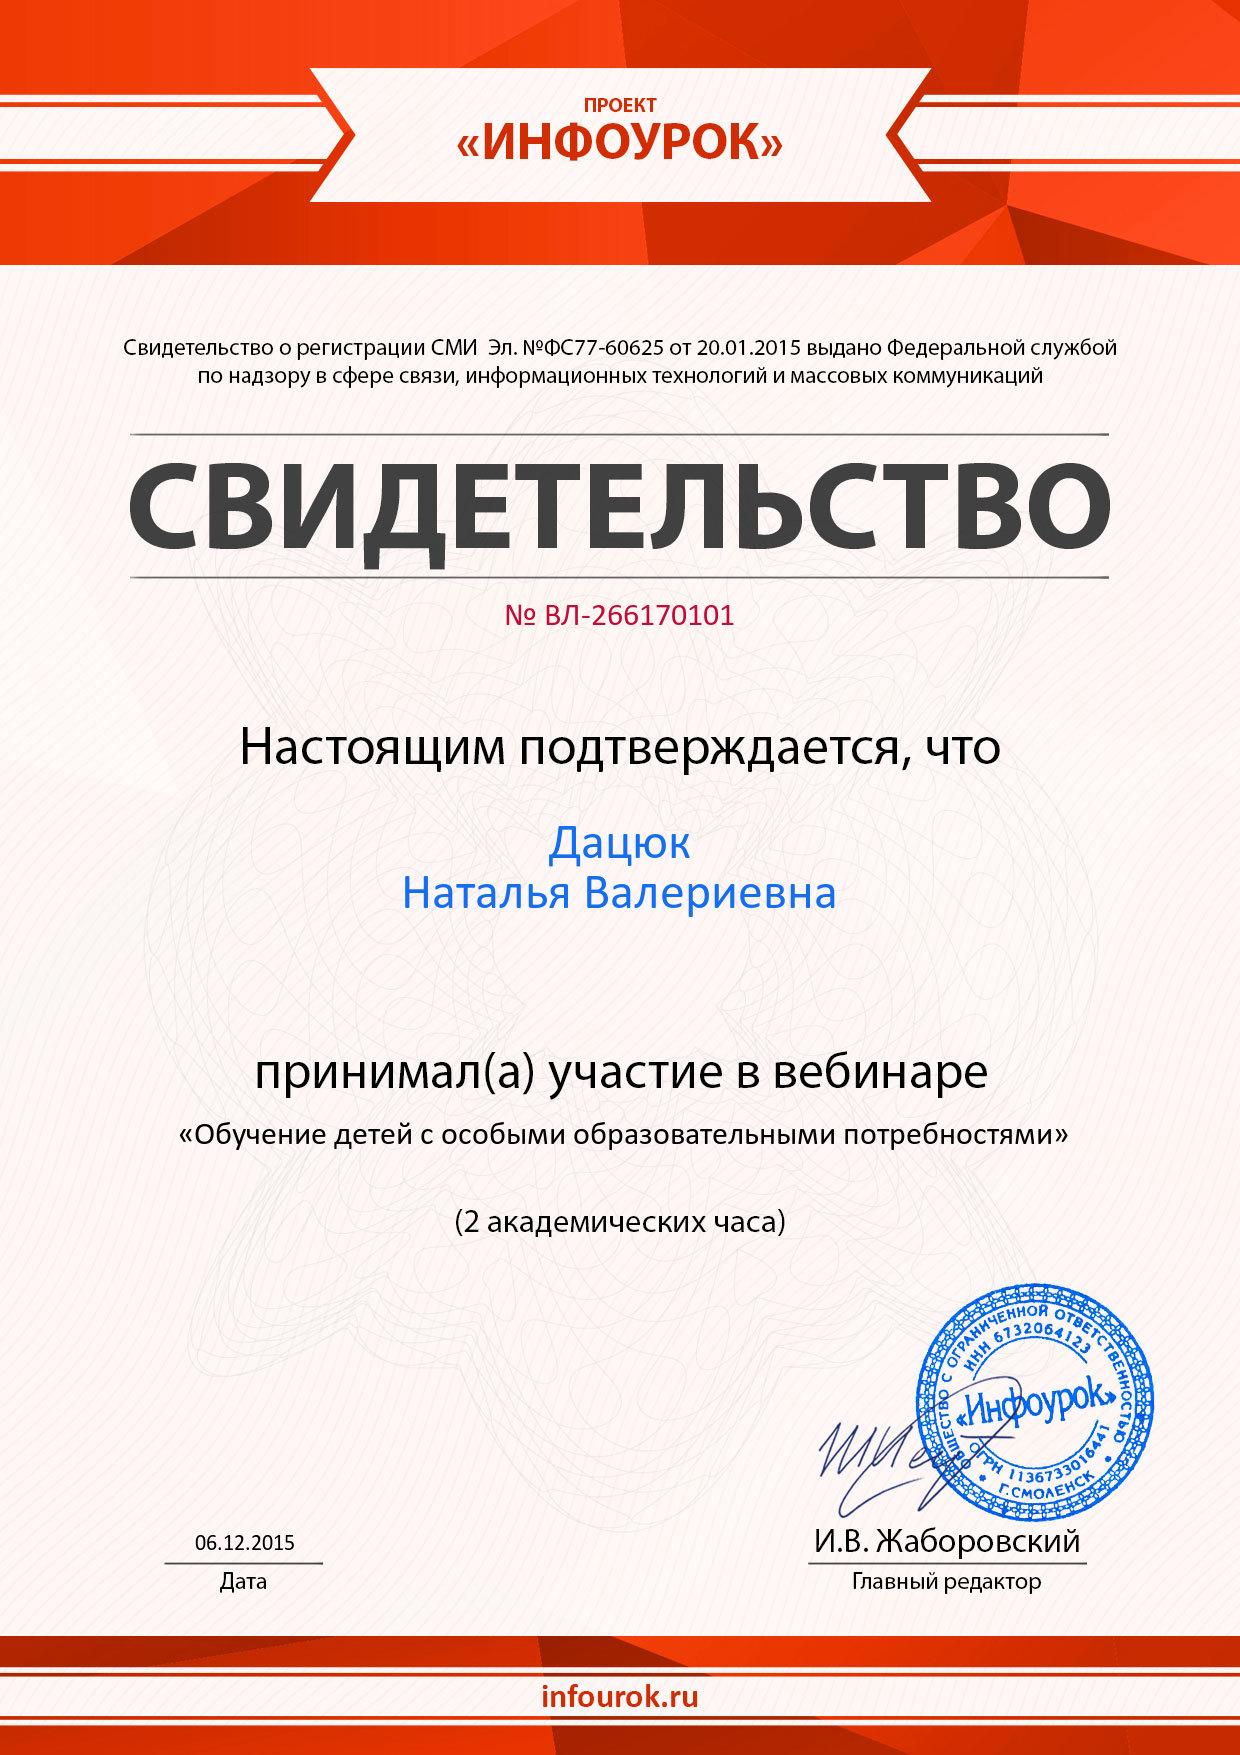 C:\Users\COMPP\Downloads\Свидетельство проекта infourok.ru № ВЛ-266170101.jpg